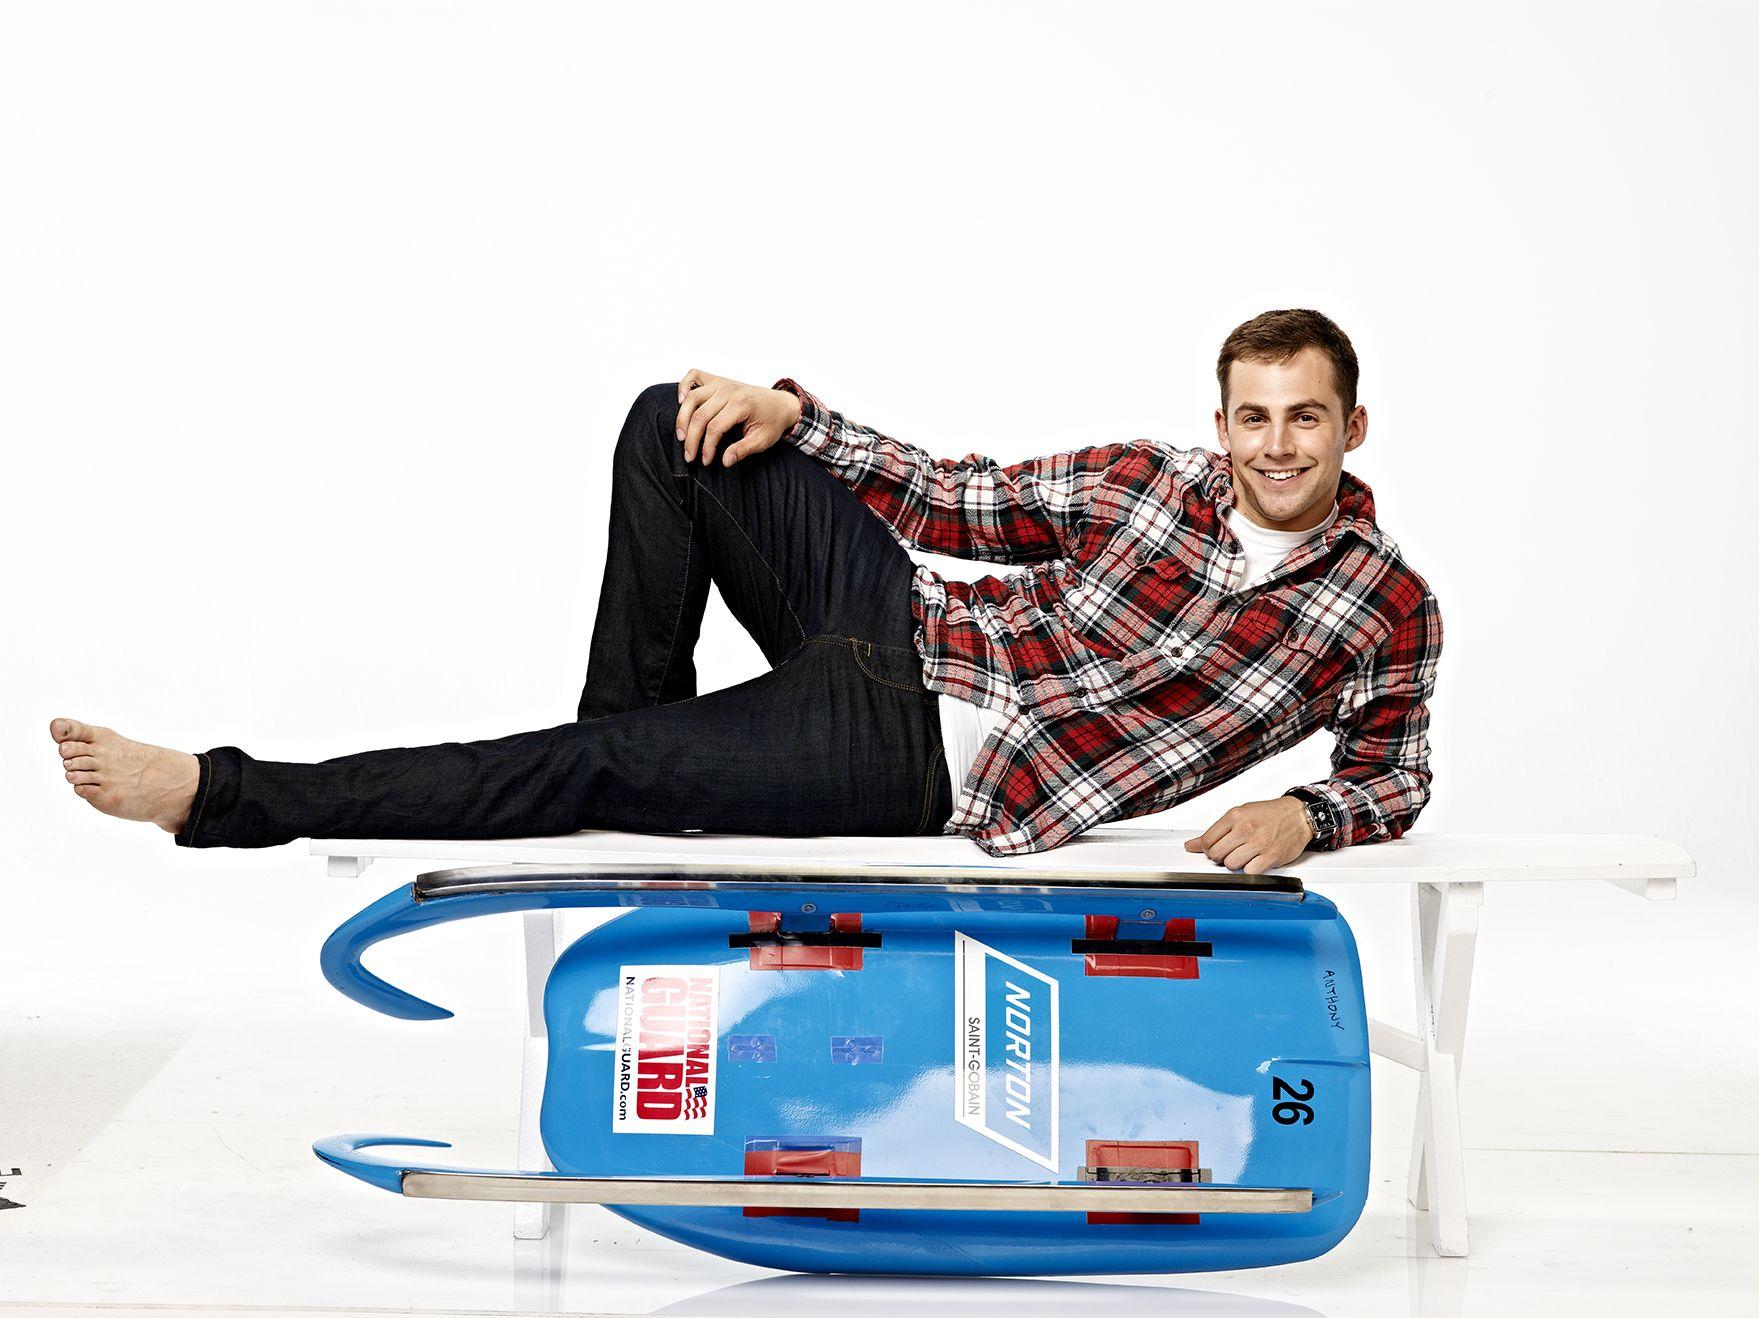 Chris Mazdzer, 2014 USA Winter Olympian — Luge Olympics